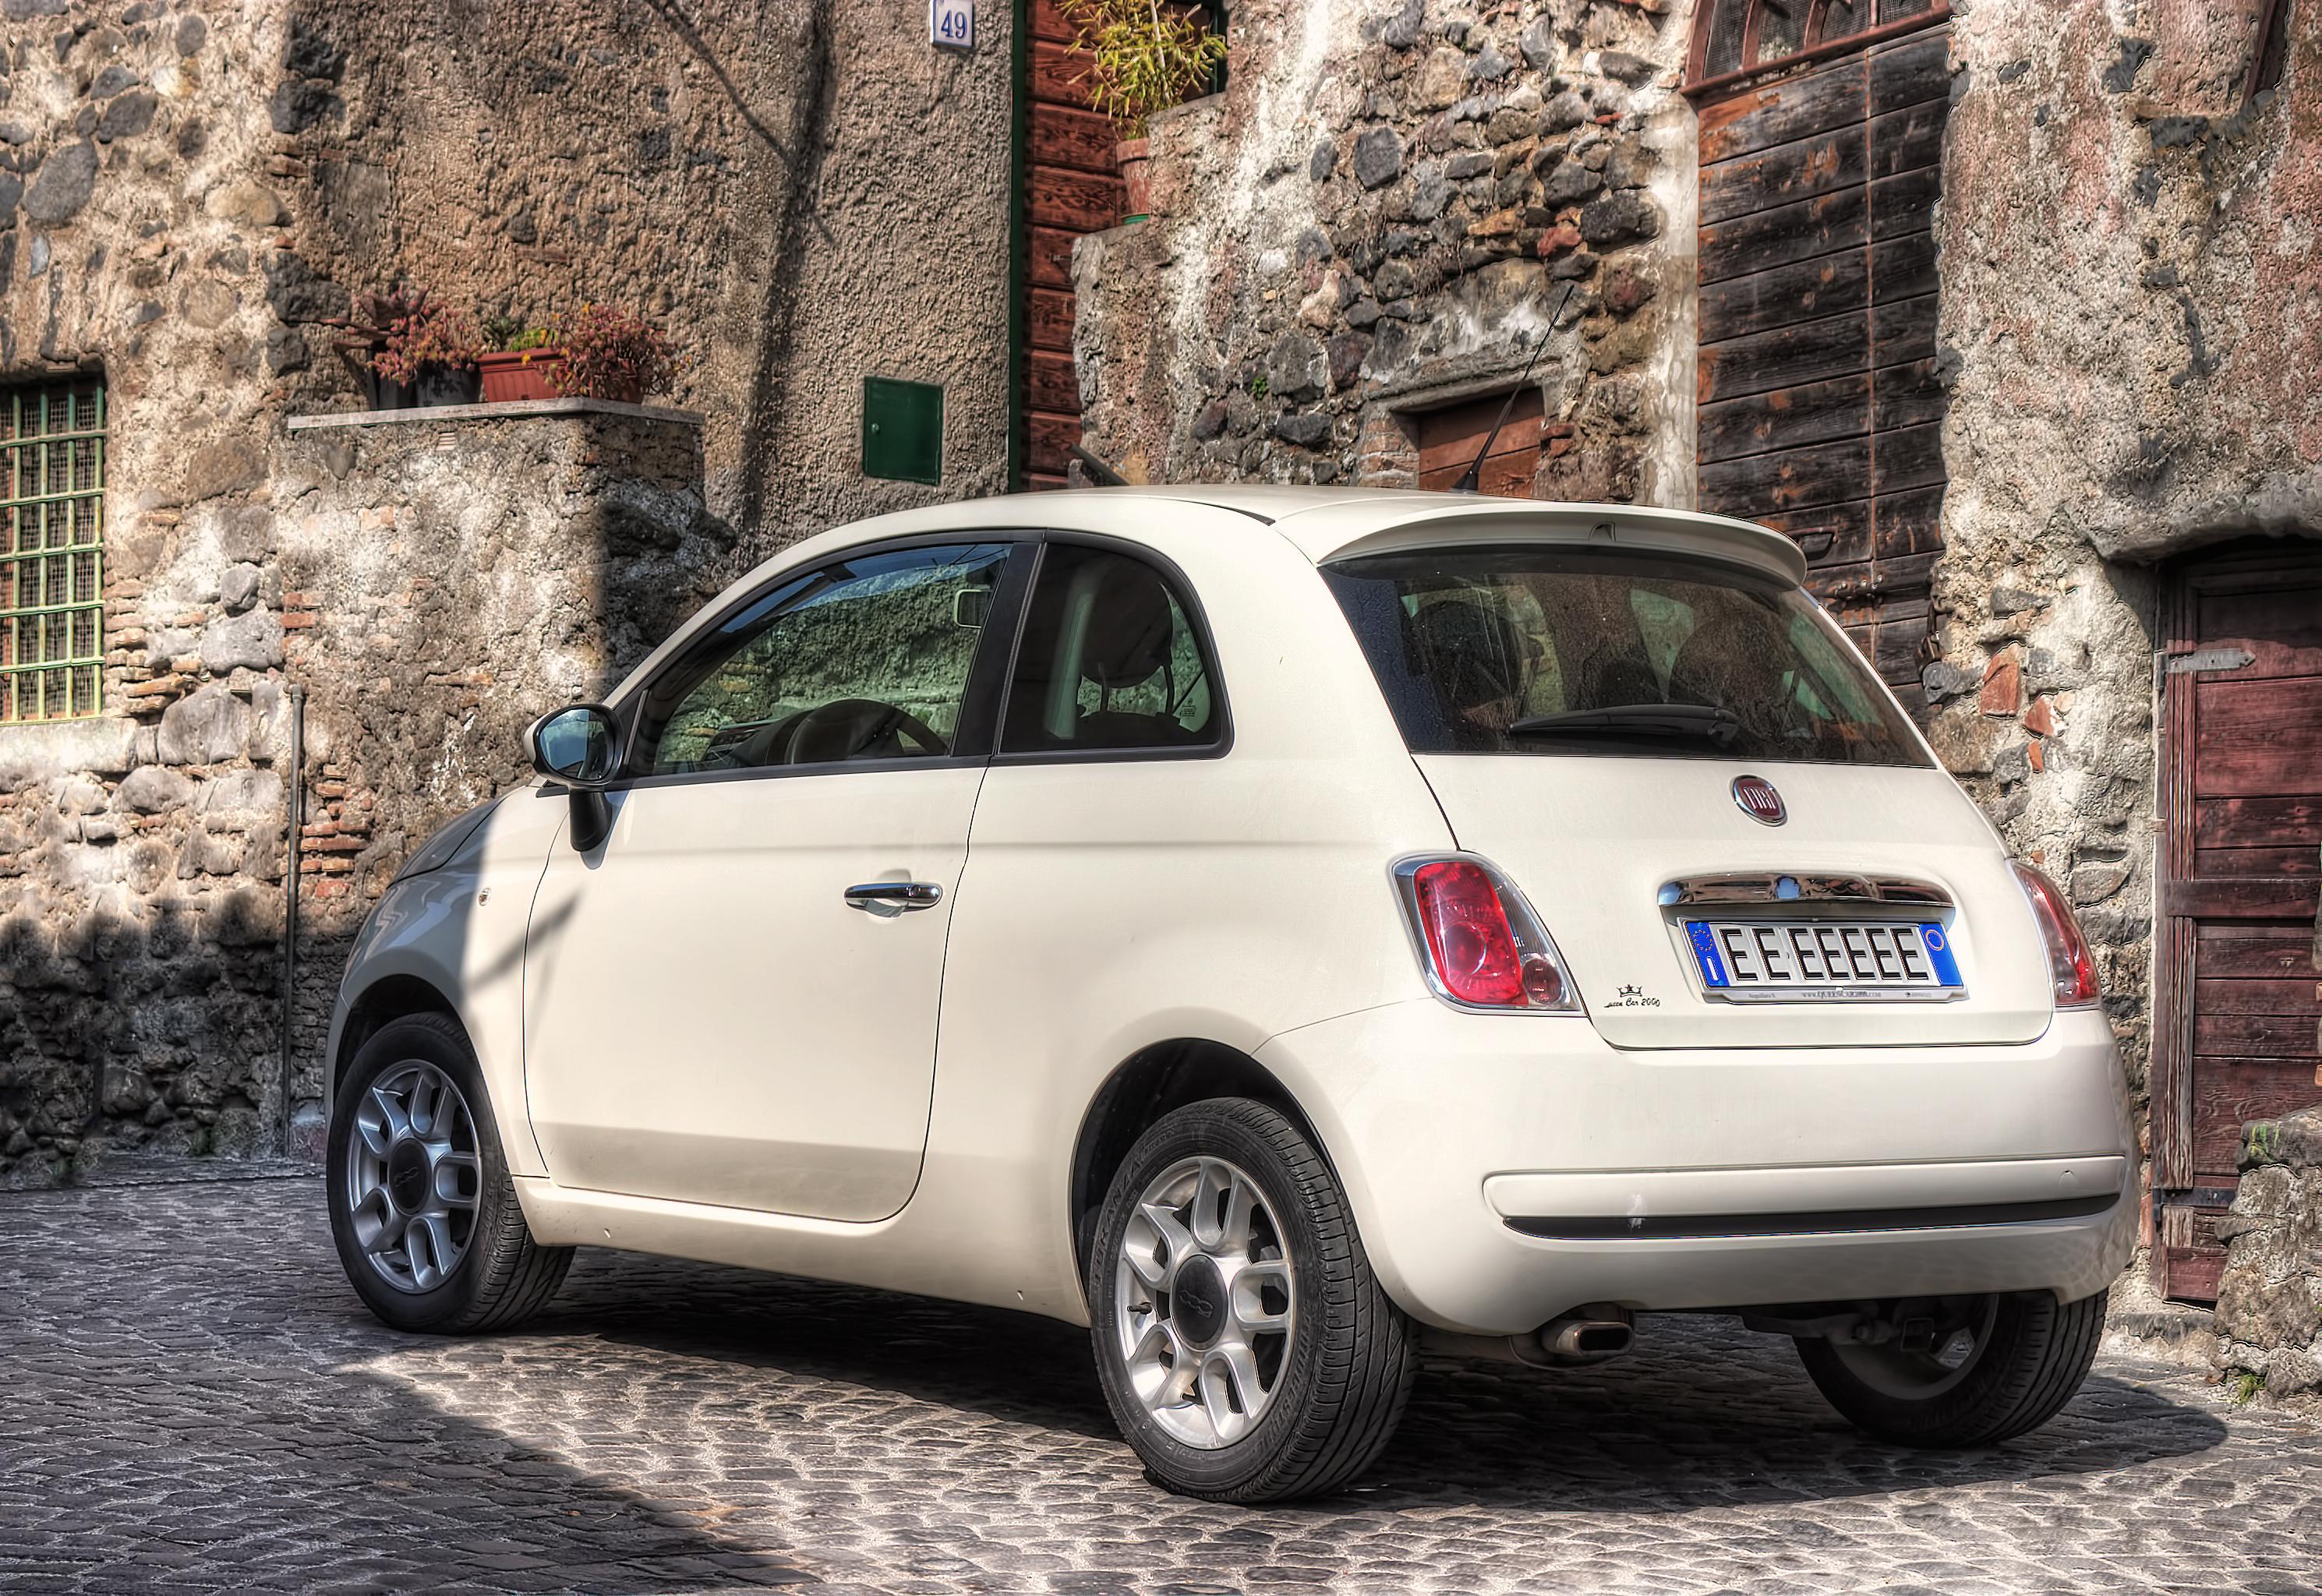 Fiat HDR Creme - Fiat 500 website